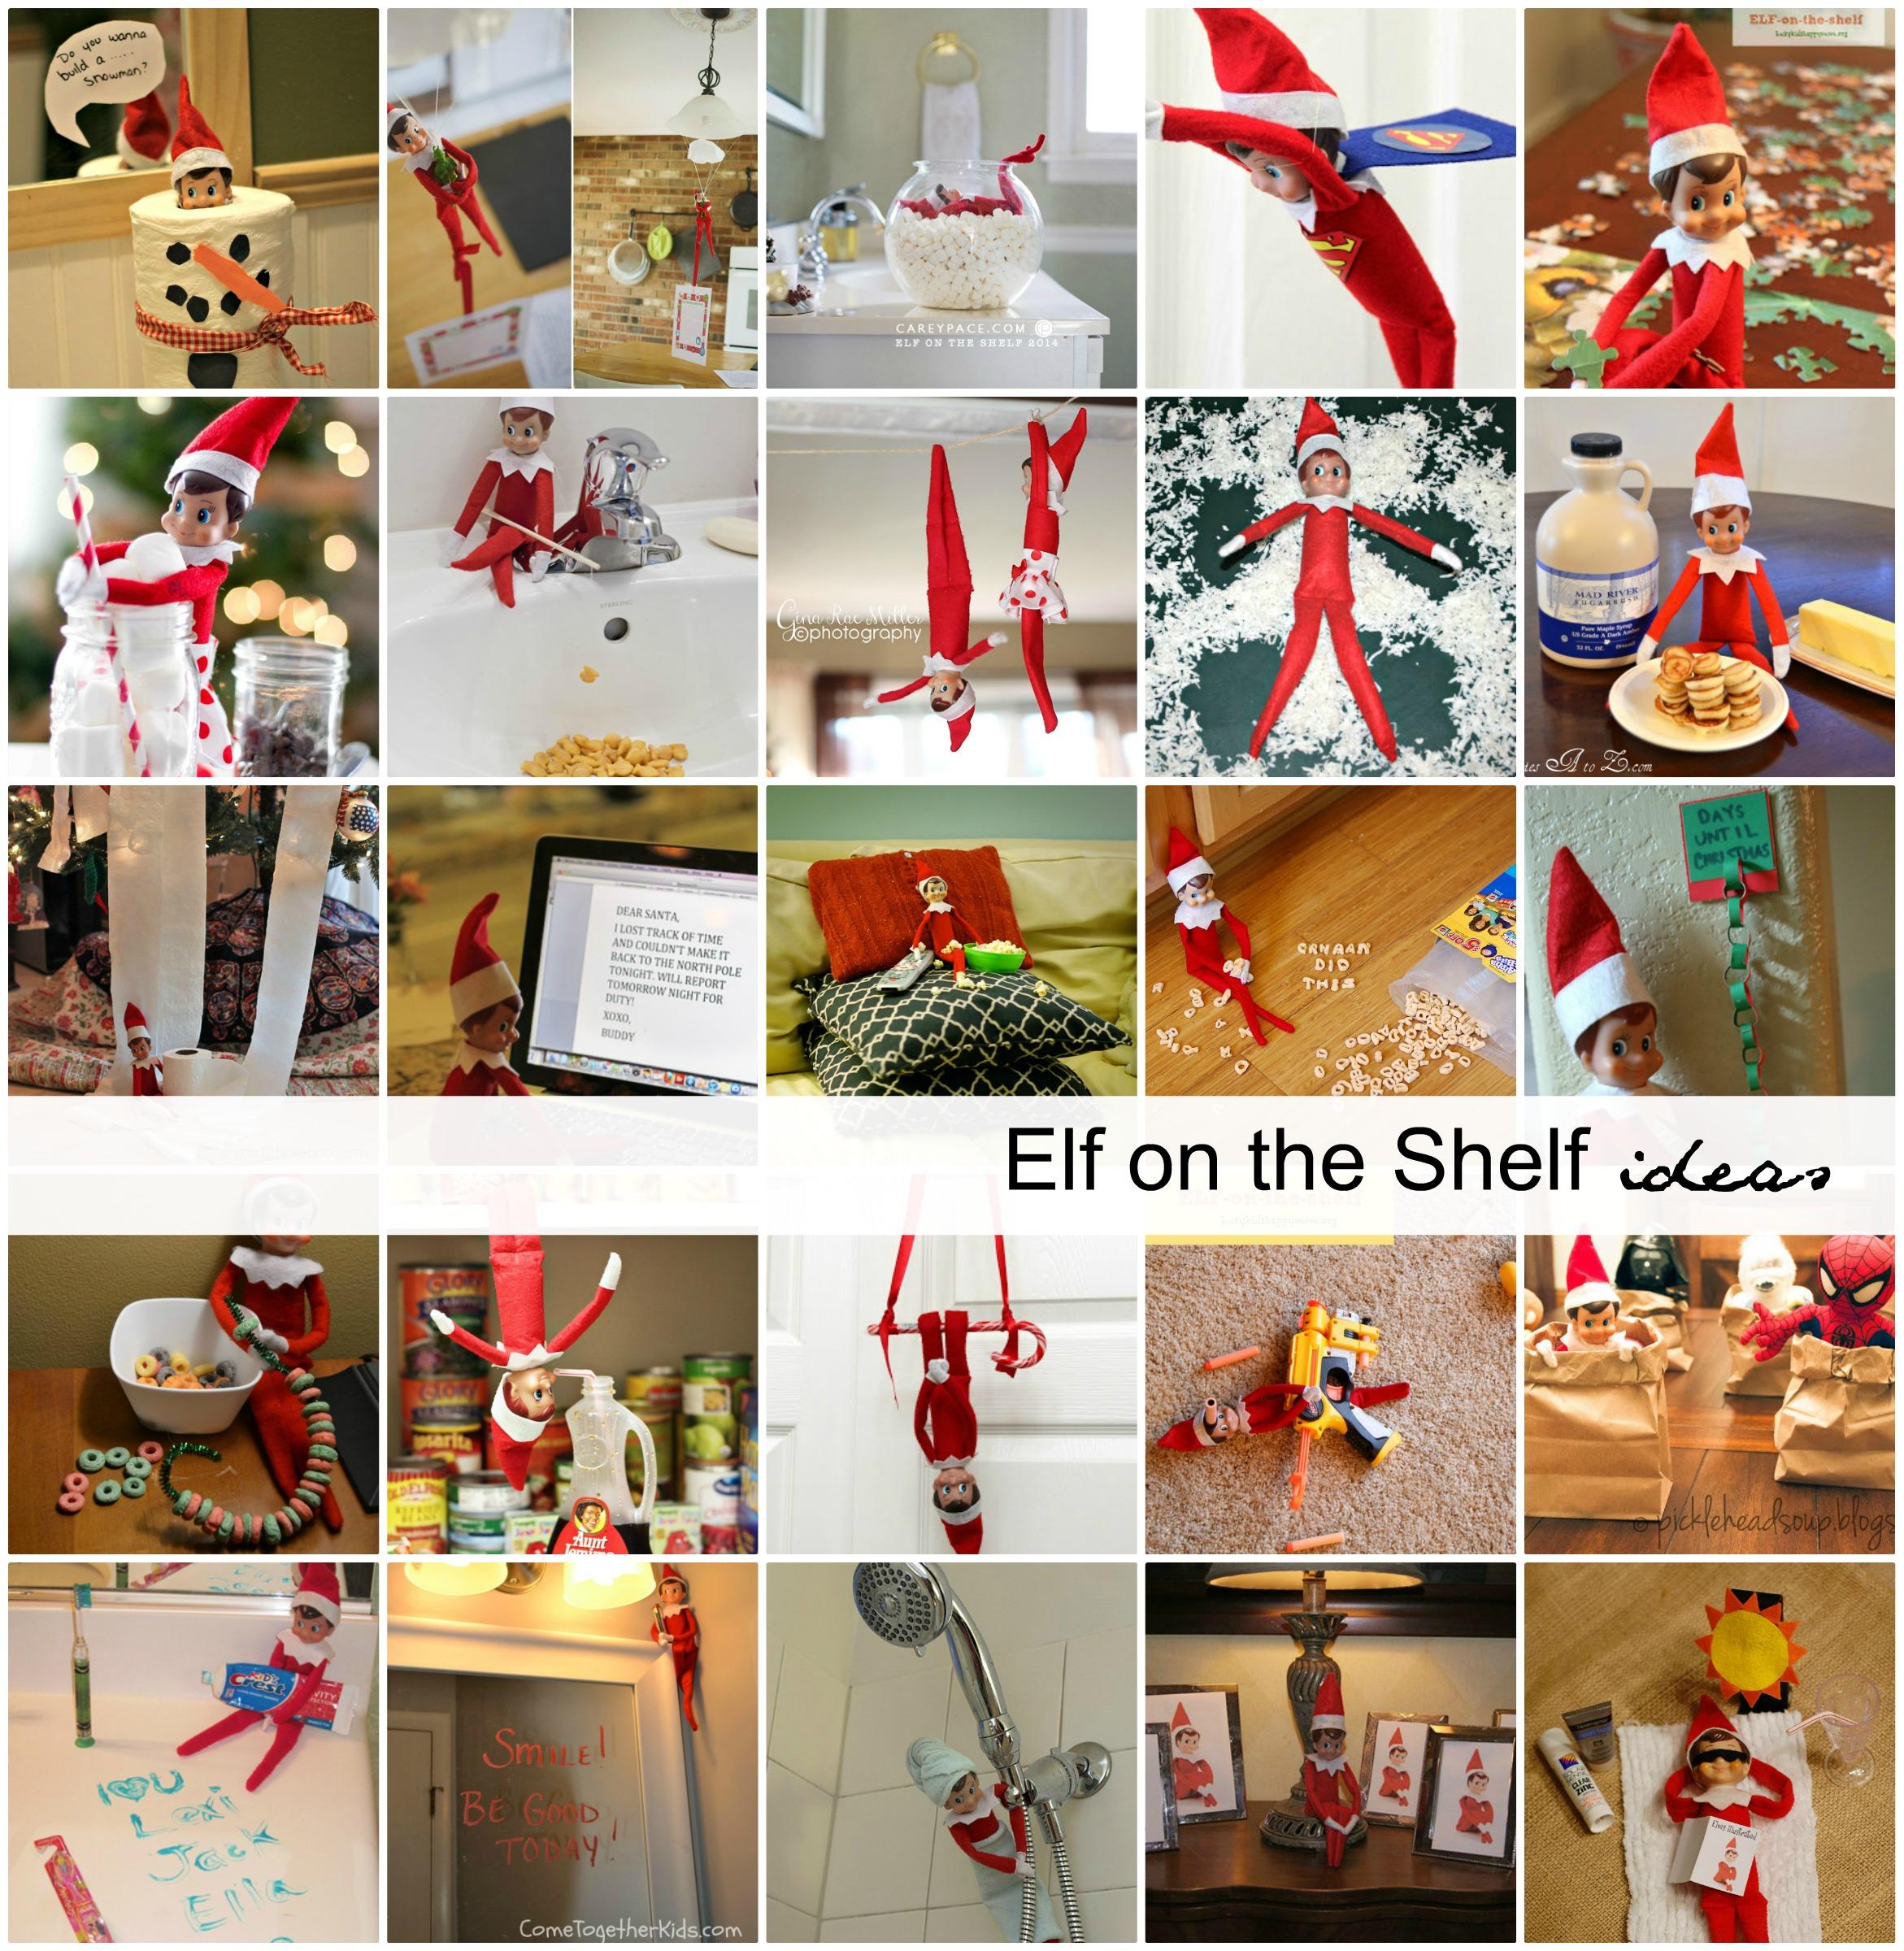 Elf-on-the-Shelf   Sharing 25 creative Elf on the Shelf Ideas that ...